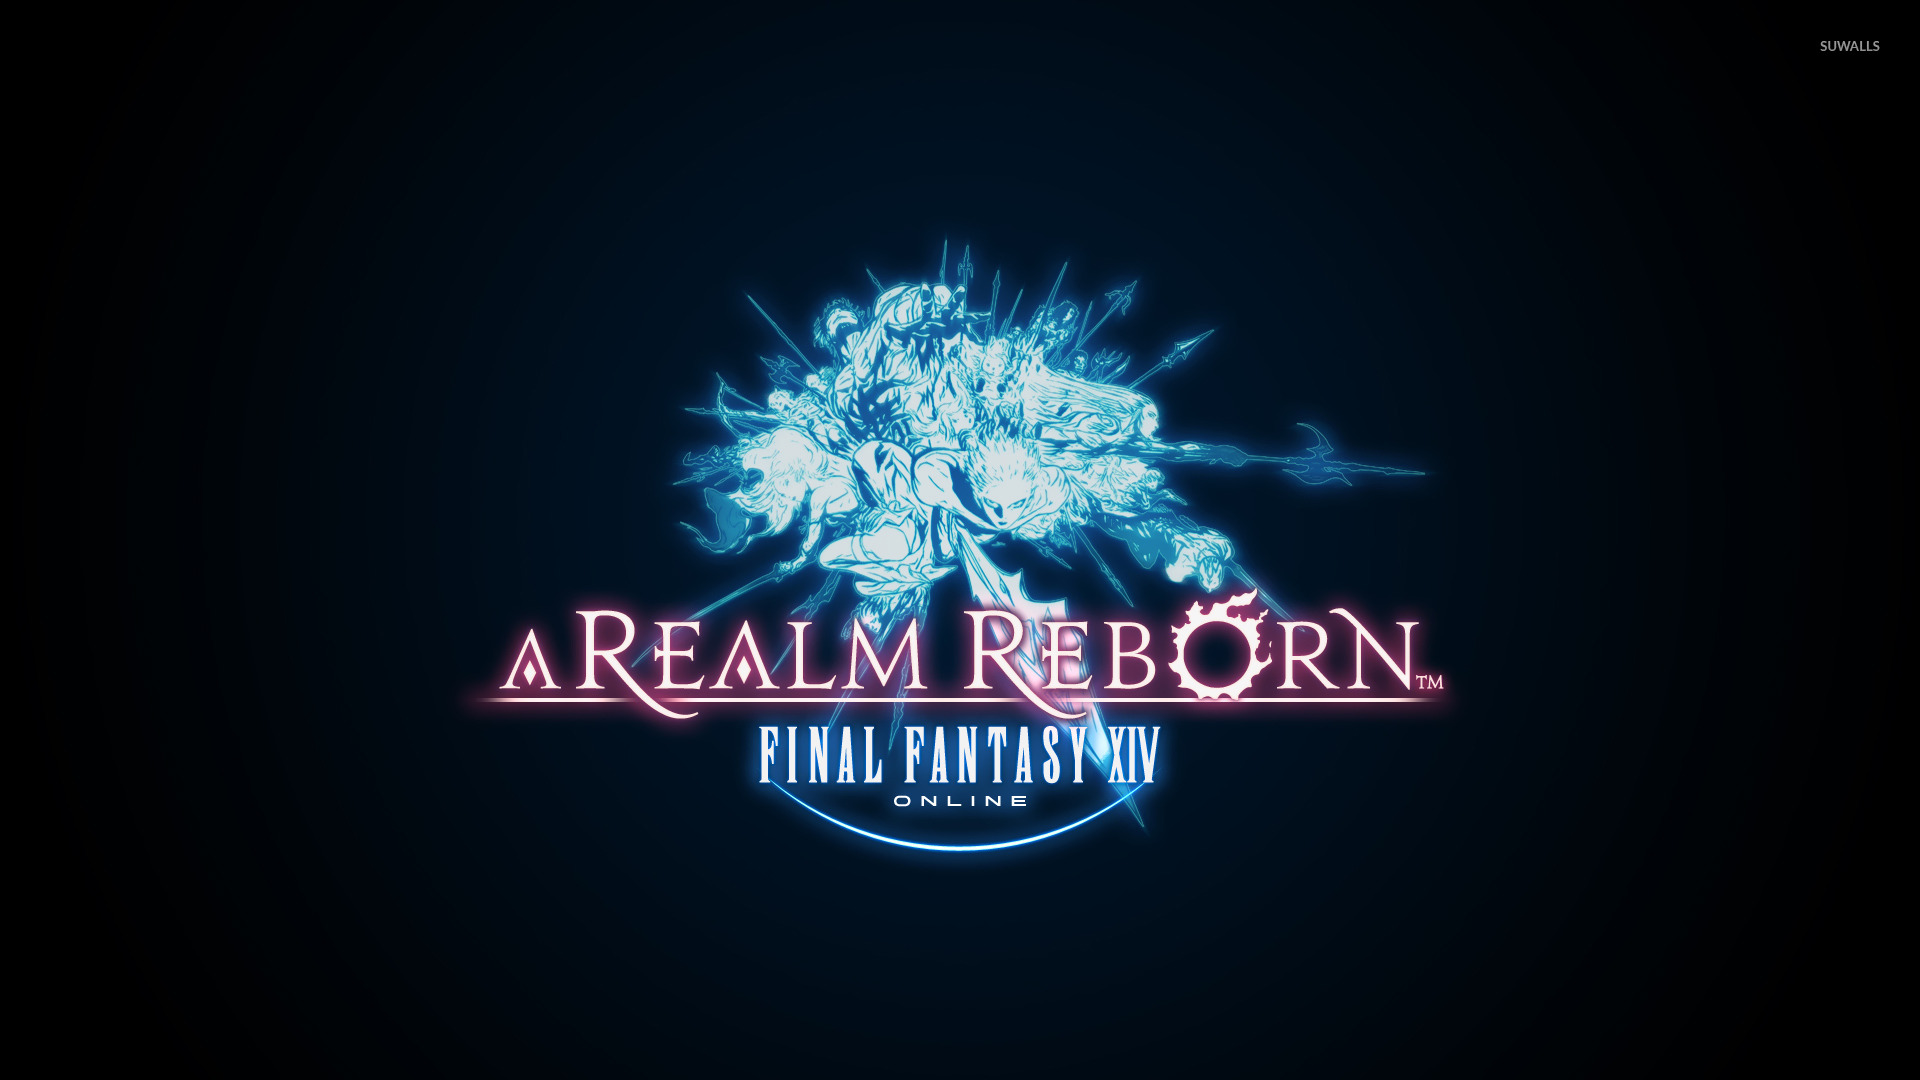 Final Fantasy Xiv A Realm Reborn Wallpaper Game Wallpapers 18506